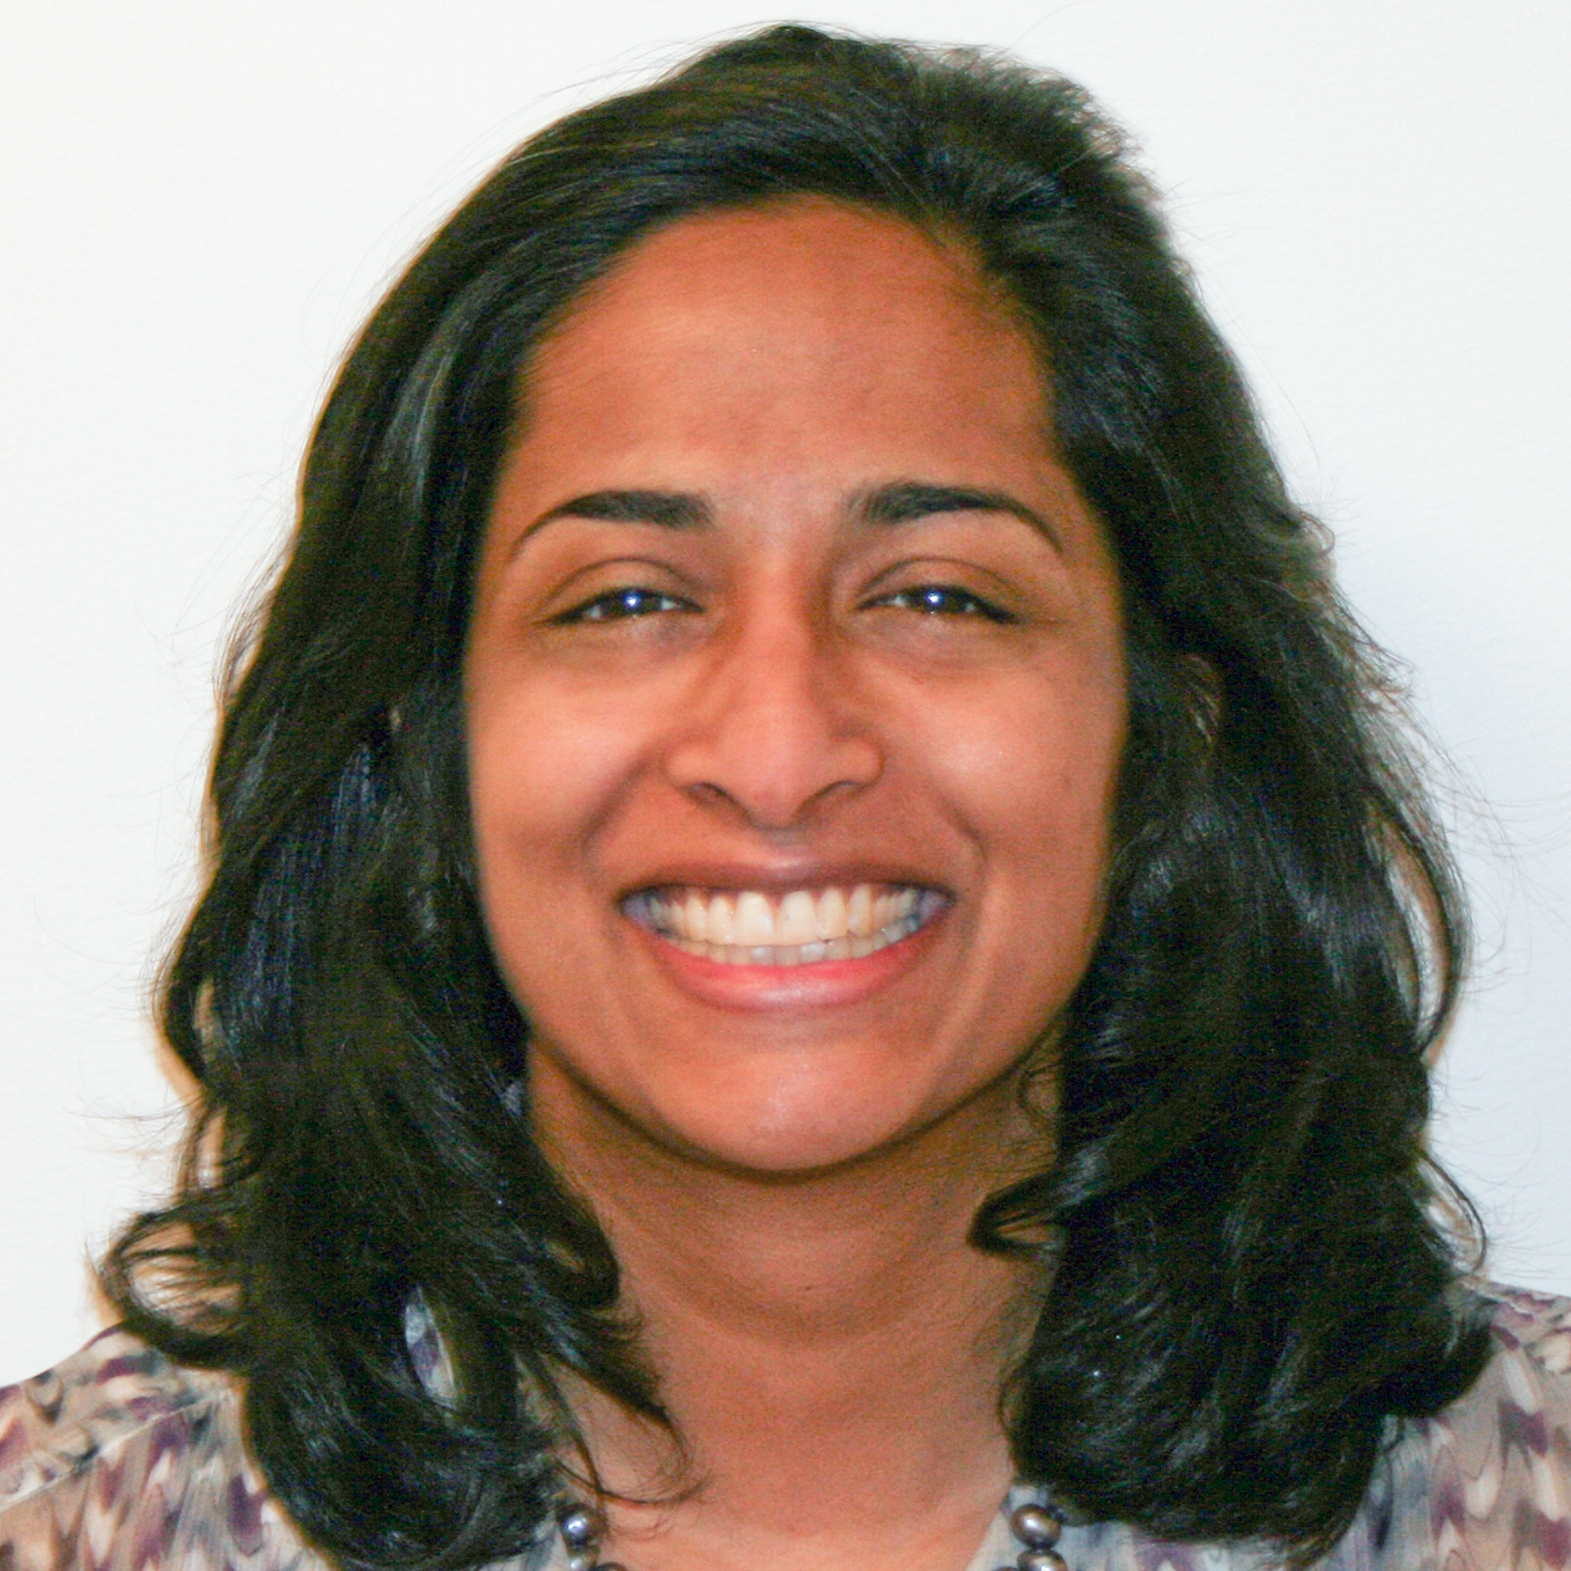 Indu SpugnardiCatholic Health Association of the United States - Indu Spugnardi is the Director of Advocacy & Resource Development. The Catholic Health Association has been a member of the Supportive Care Coalition since 1995.